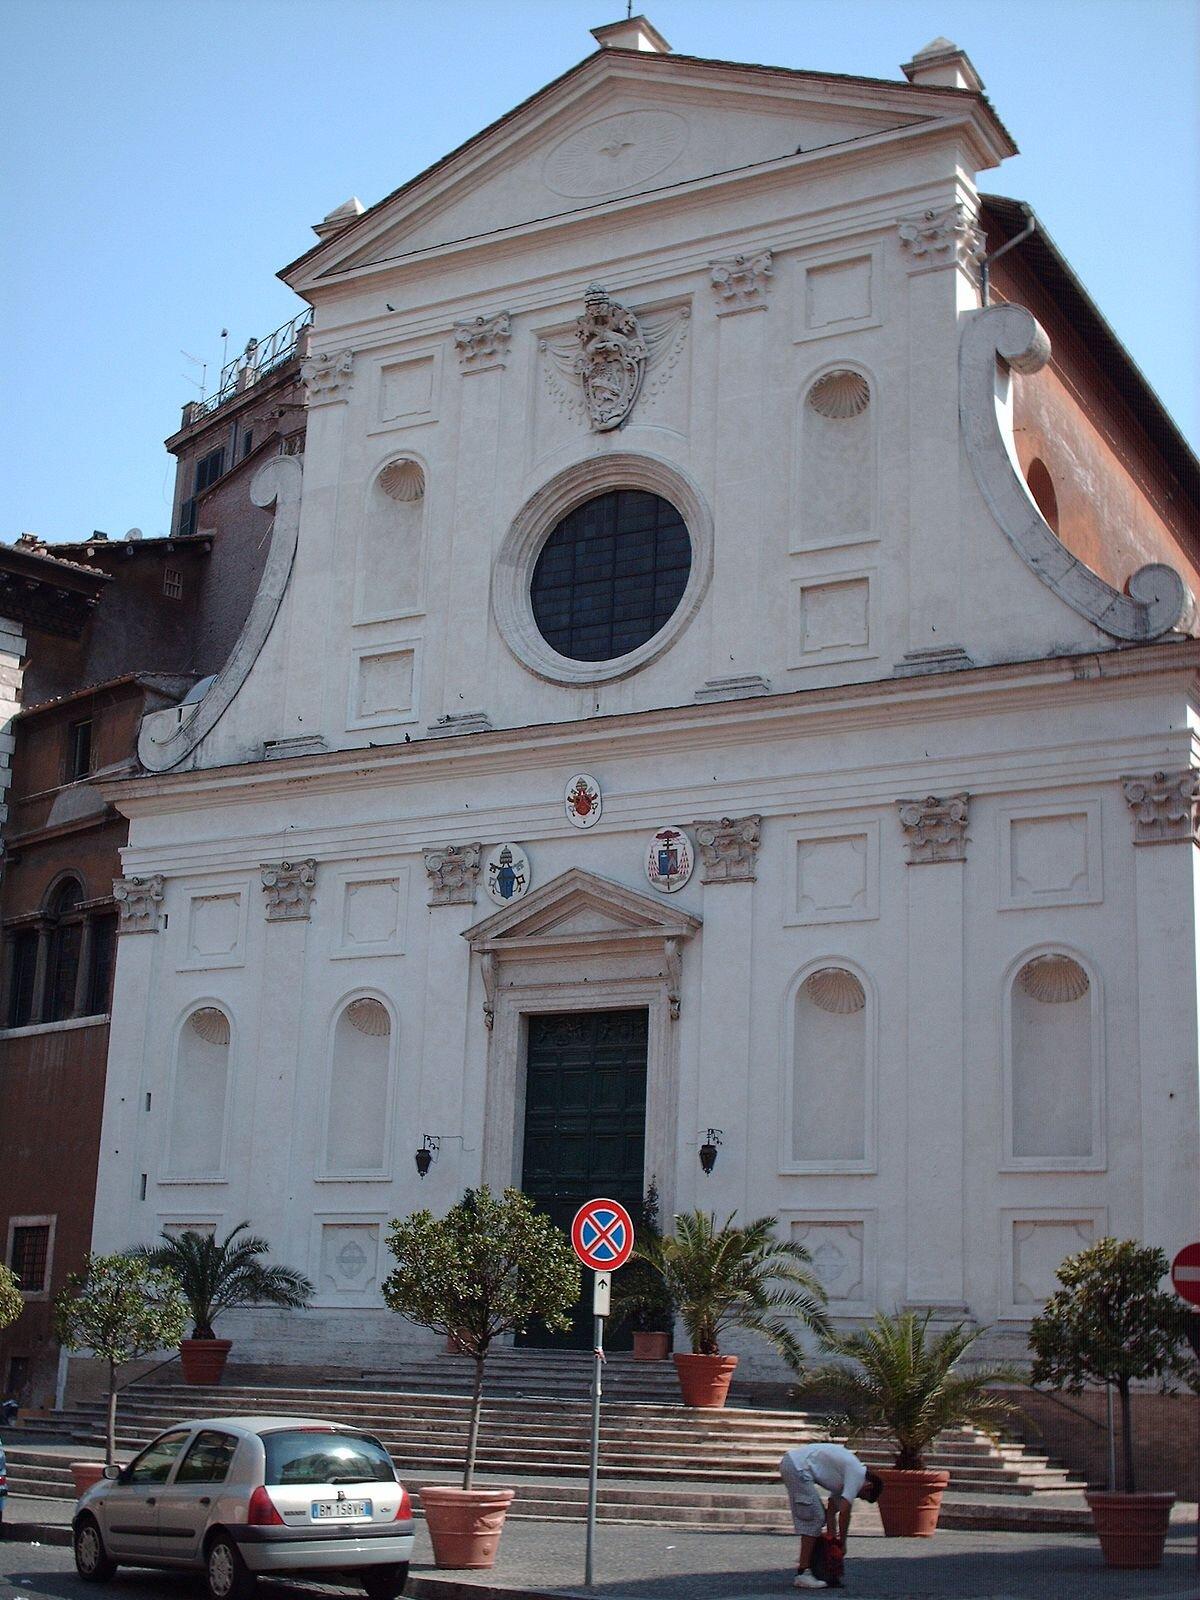 Church_of_Santo_Spirito_in_Sassia_in_Rome.jpg